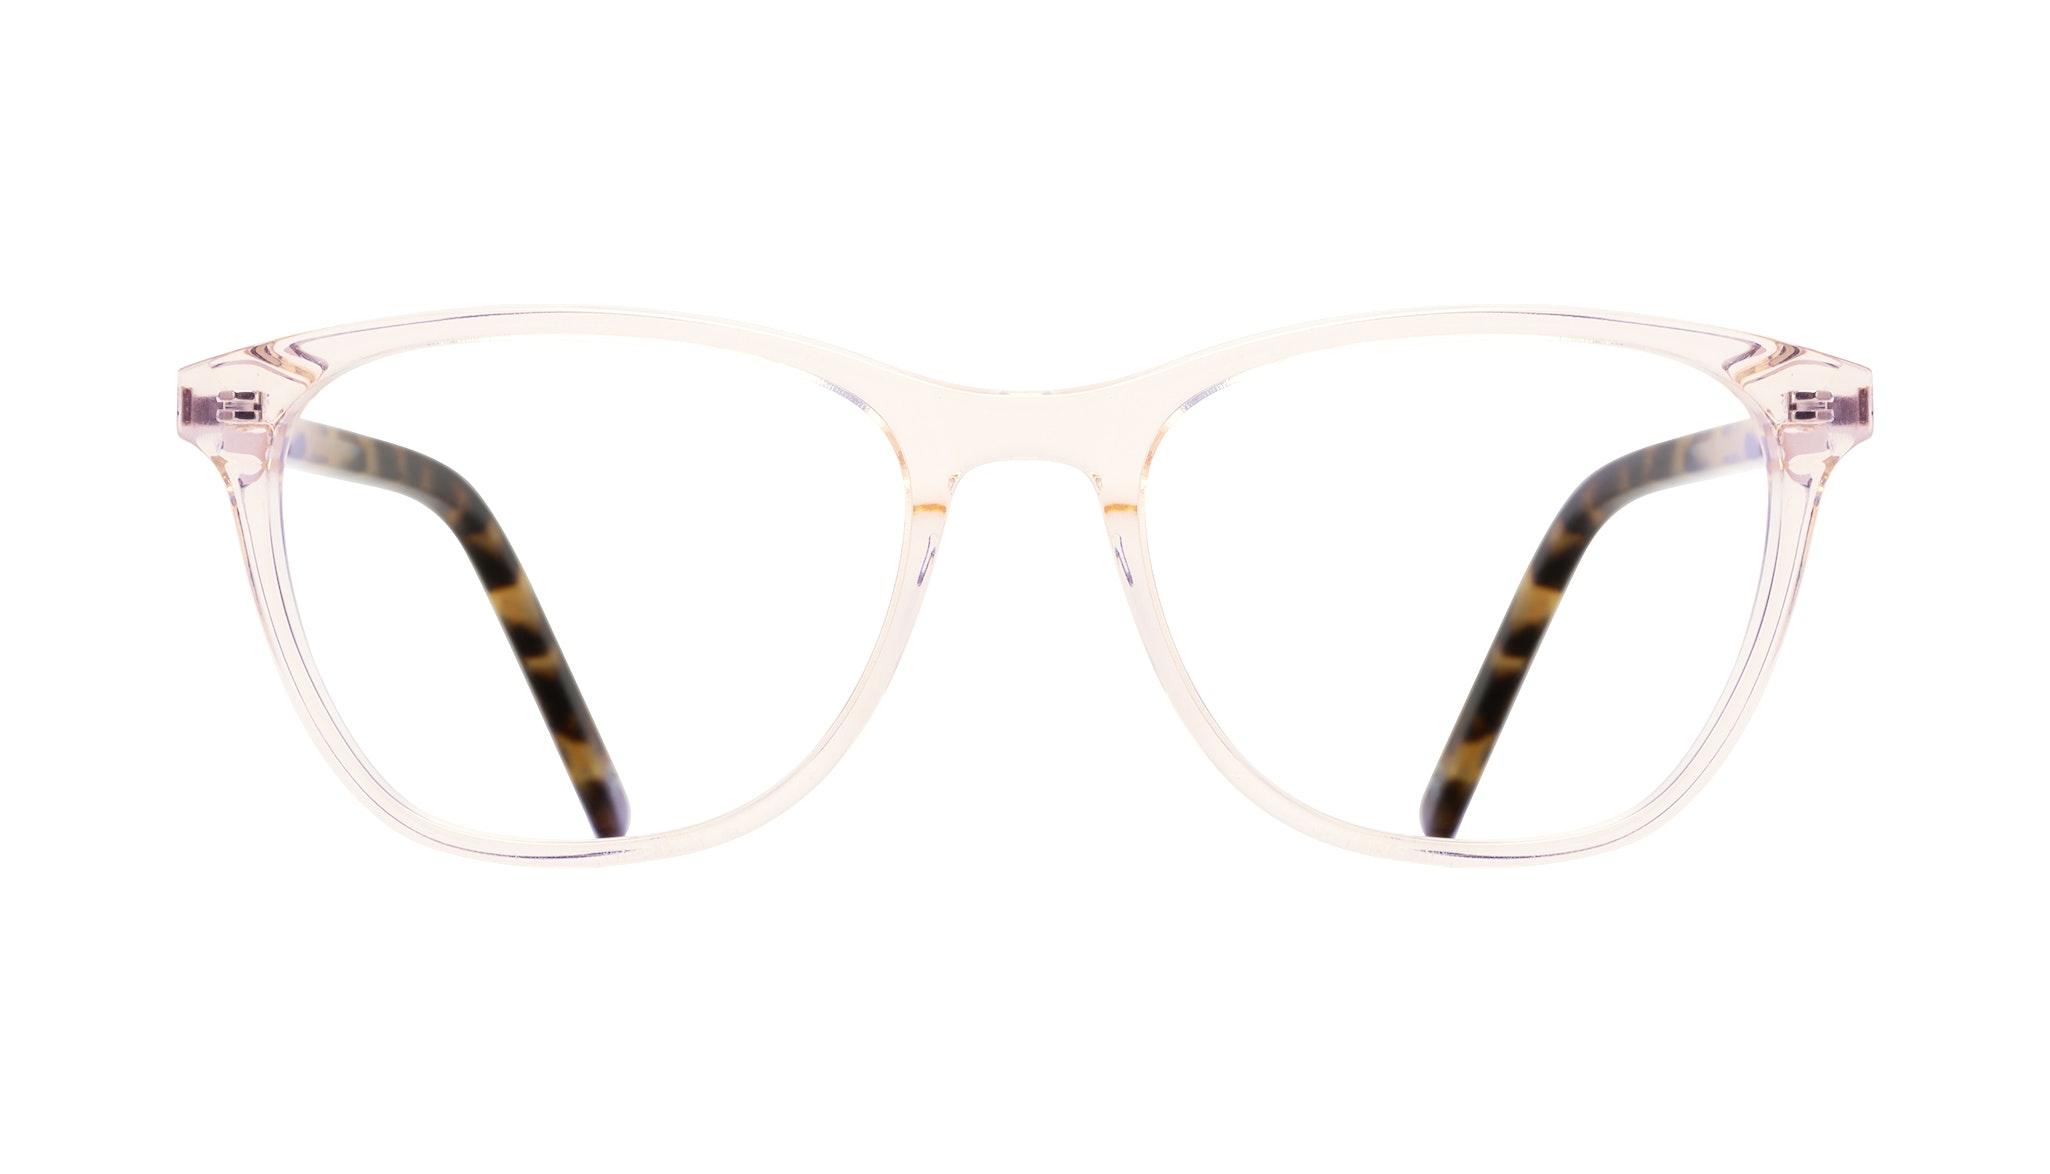 Affordable Fashion Glasses Cat Eye Rectangle Eyeglasses Women Folk Blond Tortoise